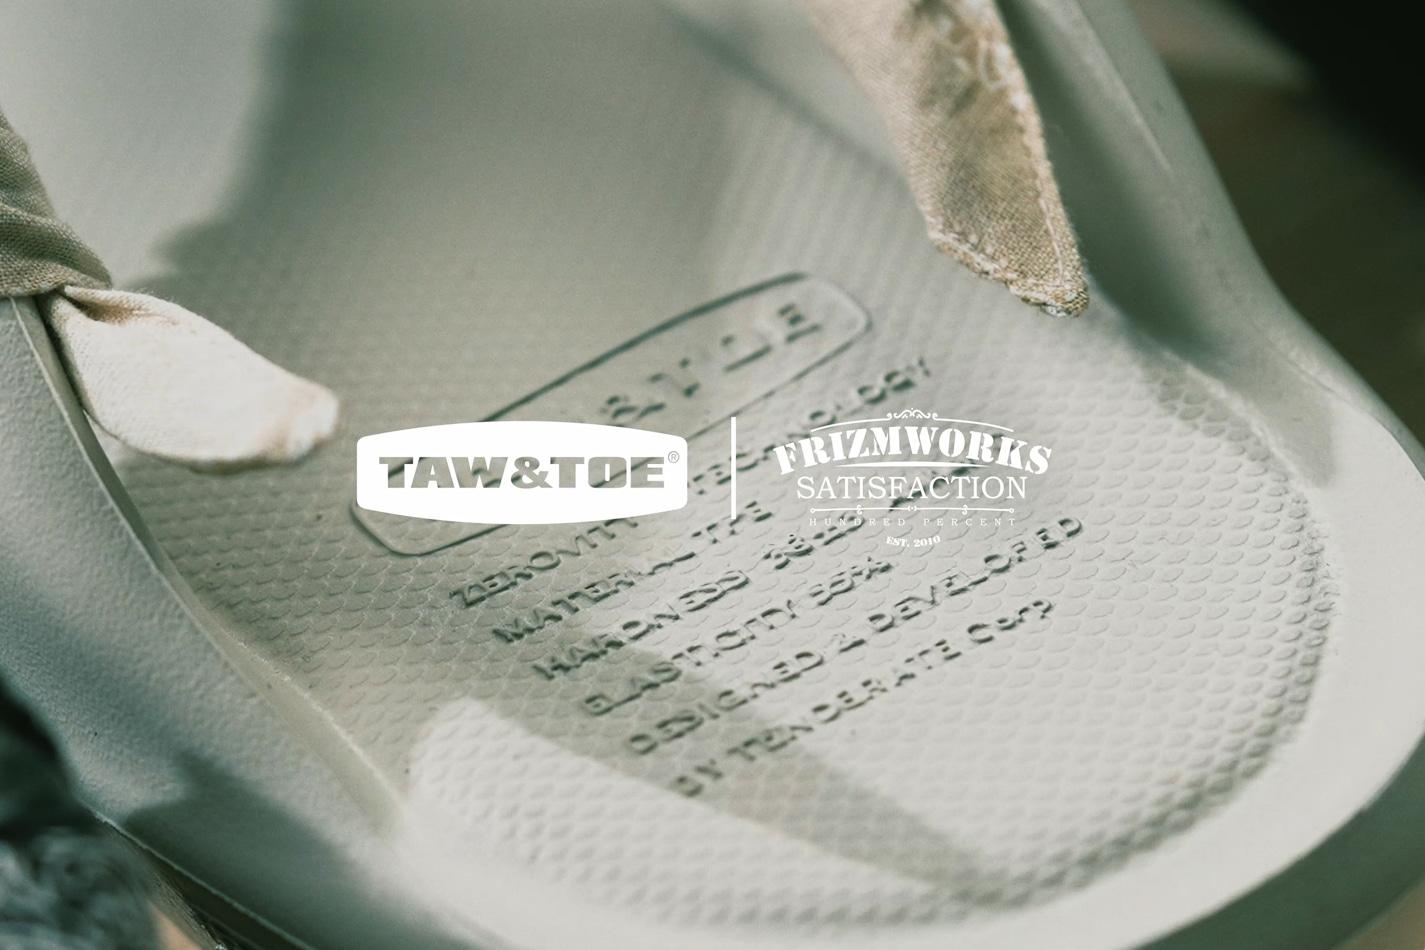 TAW&TOE® X FrizmWORKS 2021 Summer Collaboration Video